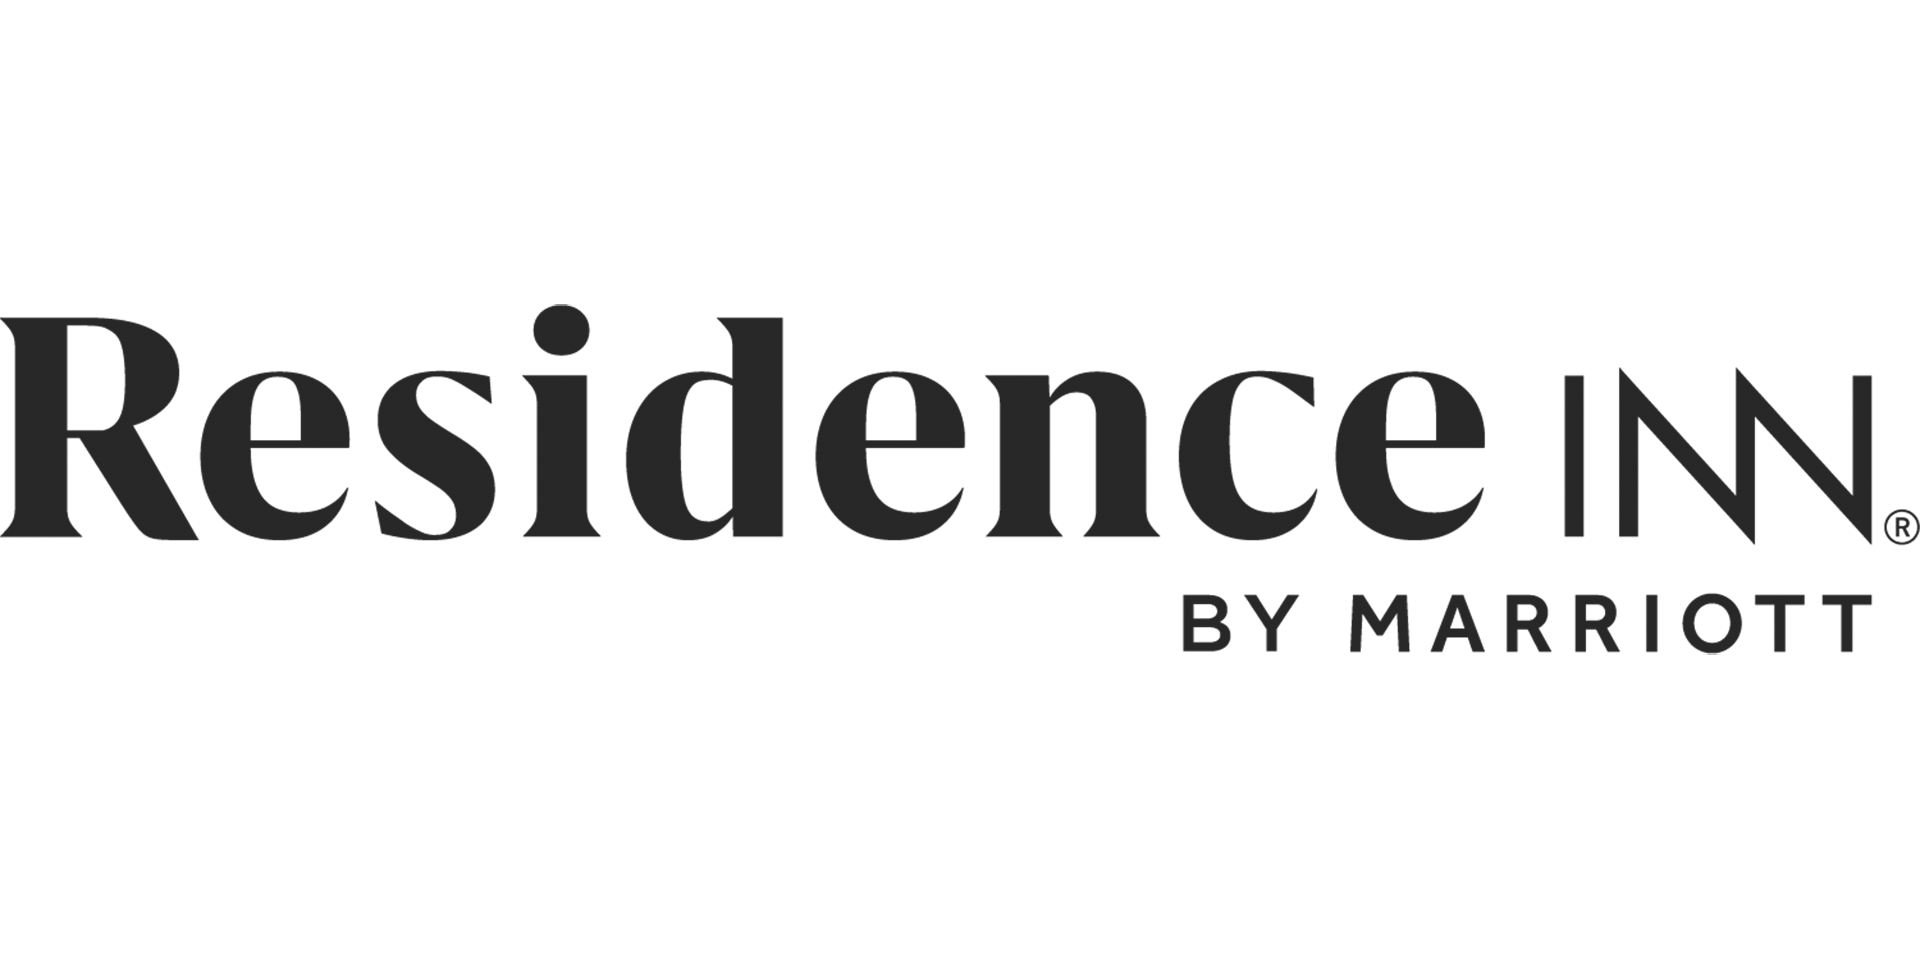 ResidenceInn_bw.png